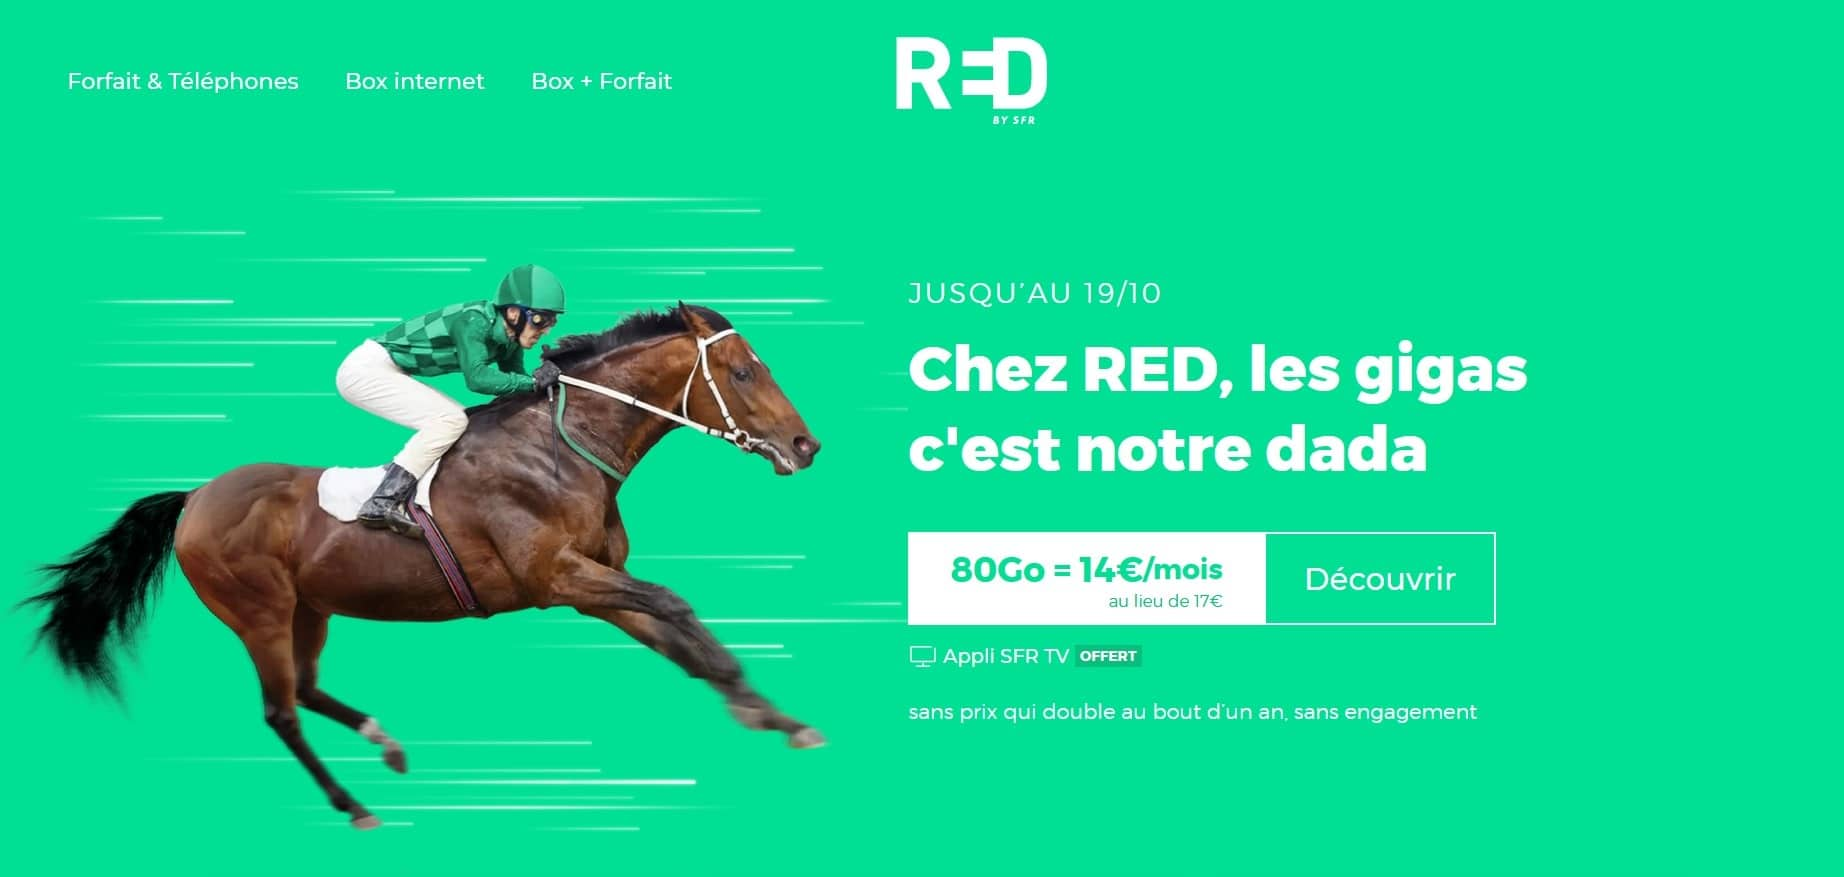 Red by SFR 80 Go à 14 € en octobre 2020